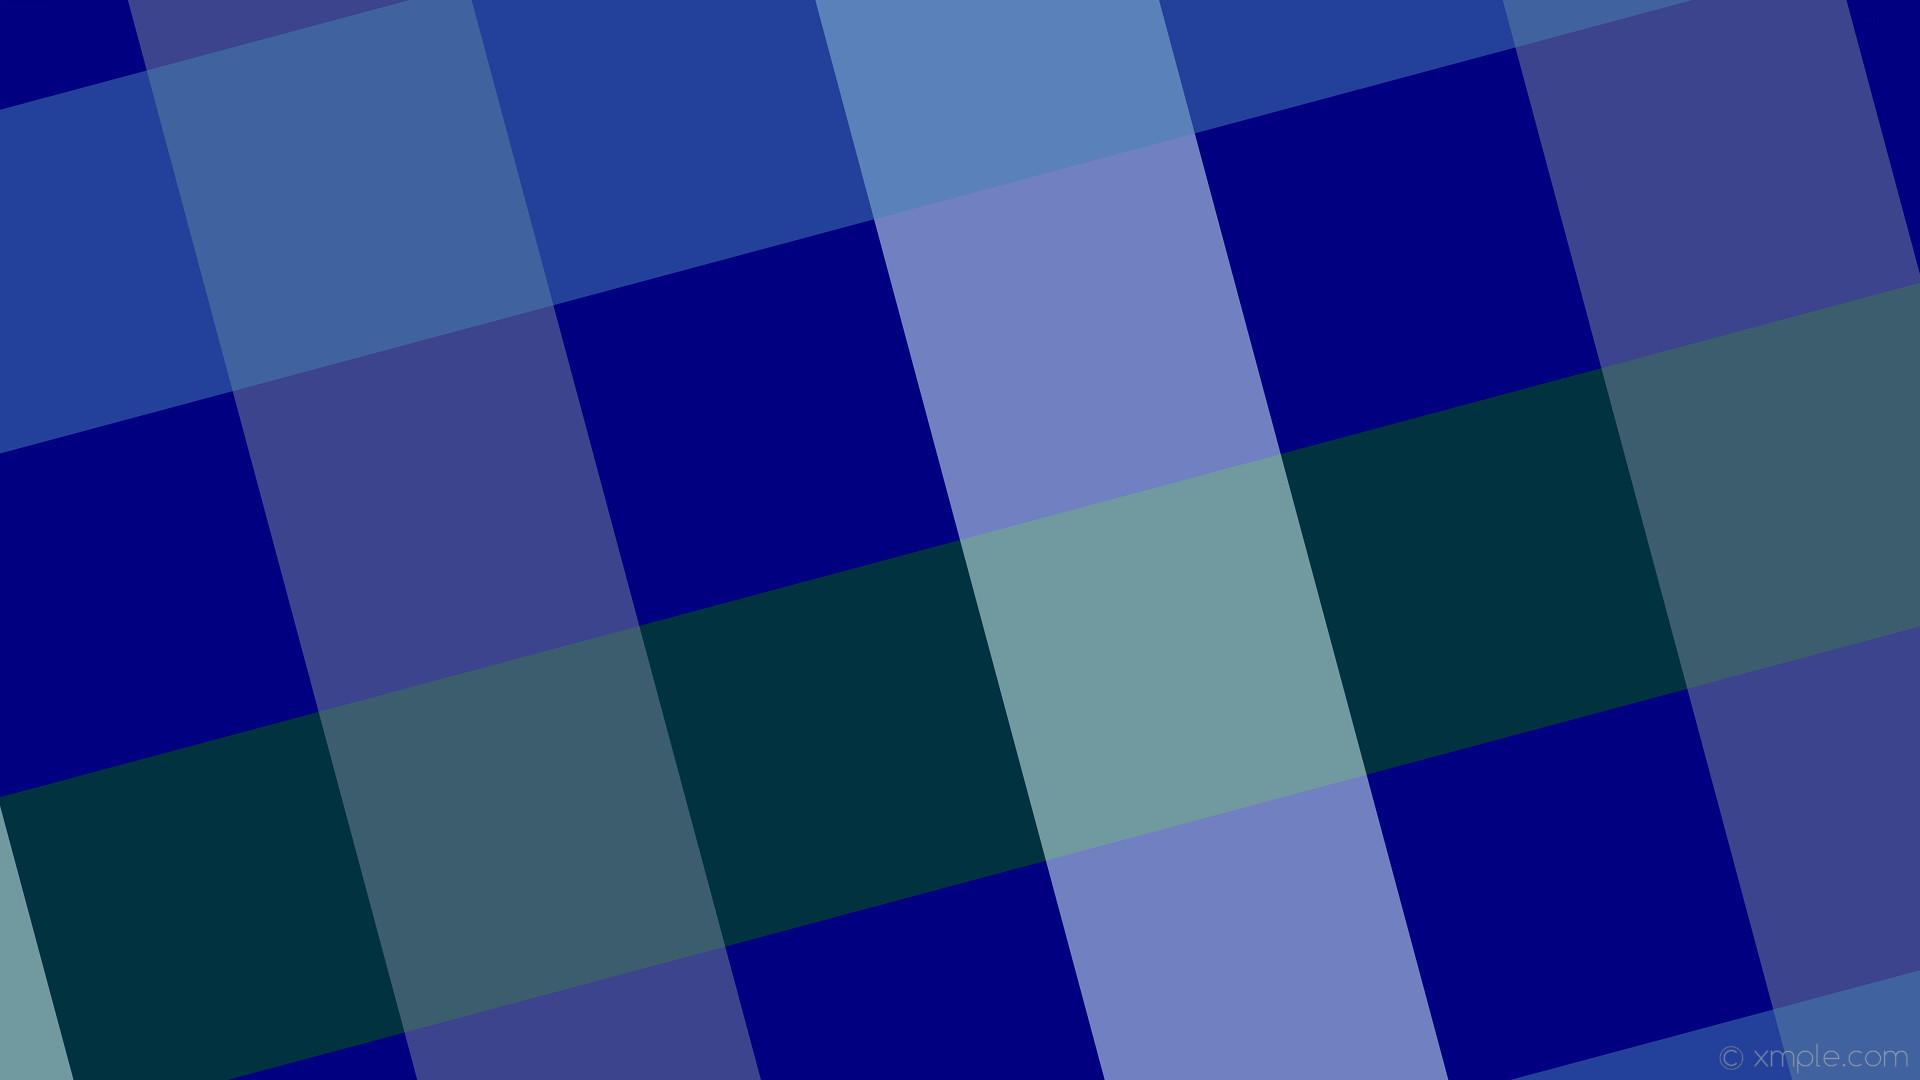 wallpaper gingham blue green penta striped grey navy dark green light cyan  light slate gray steel